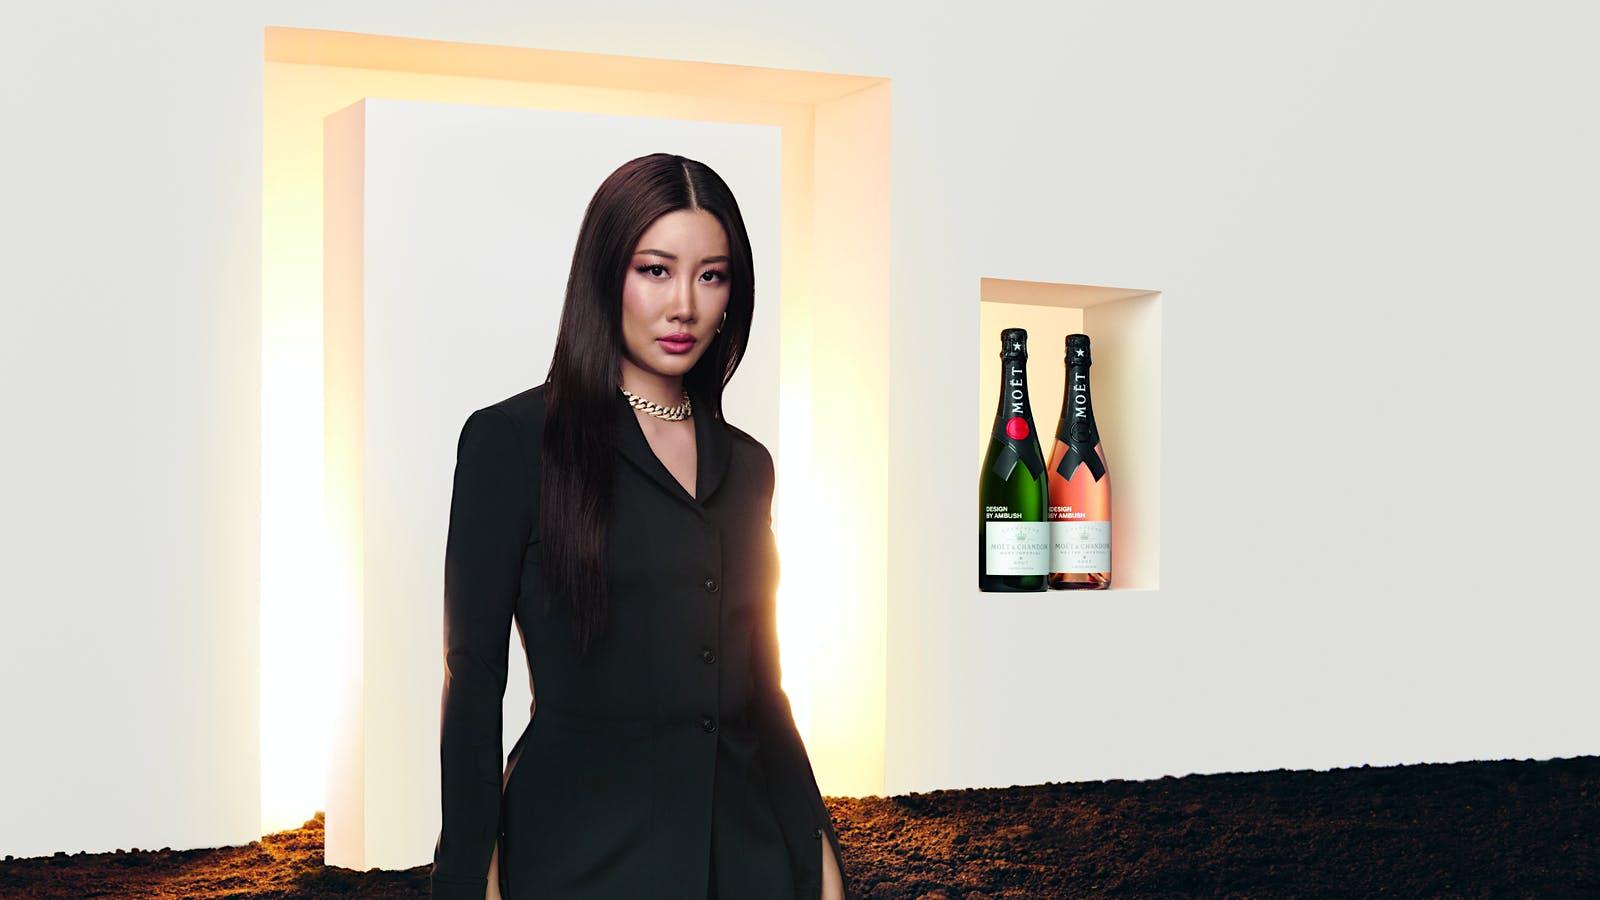 Fashion Designer Yoon Ahn Ambushes Moët Impérial Champagne